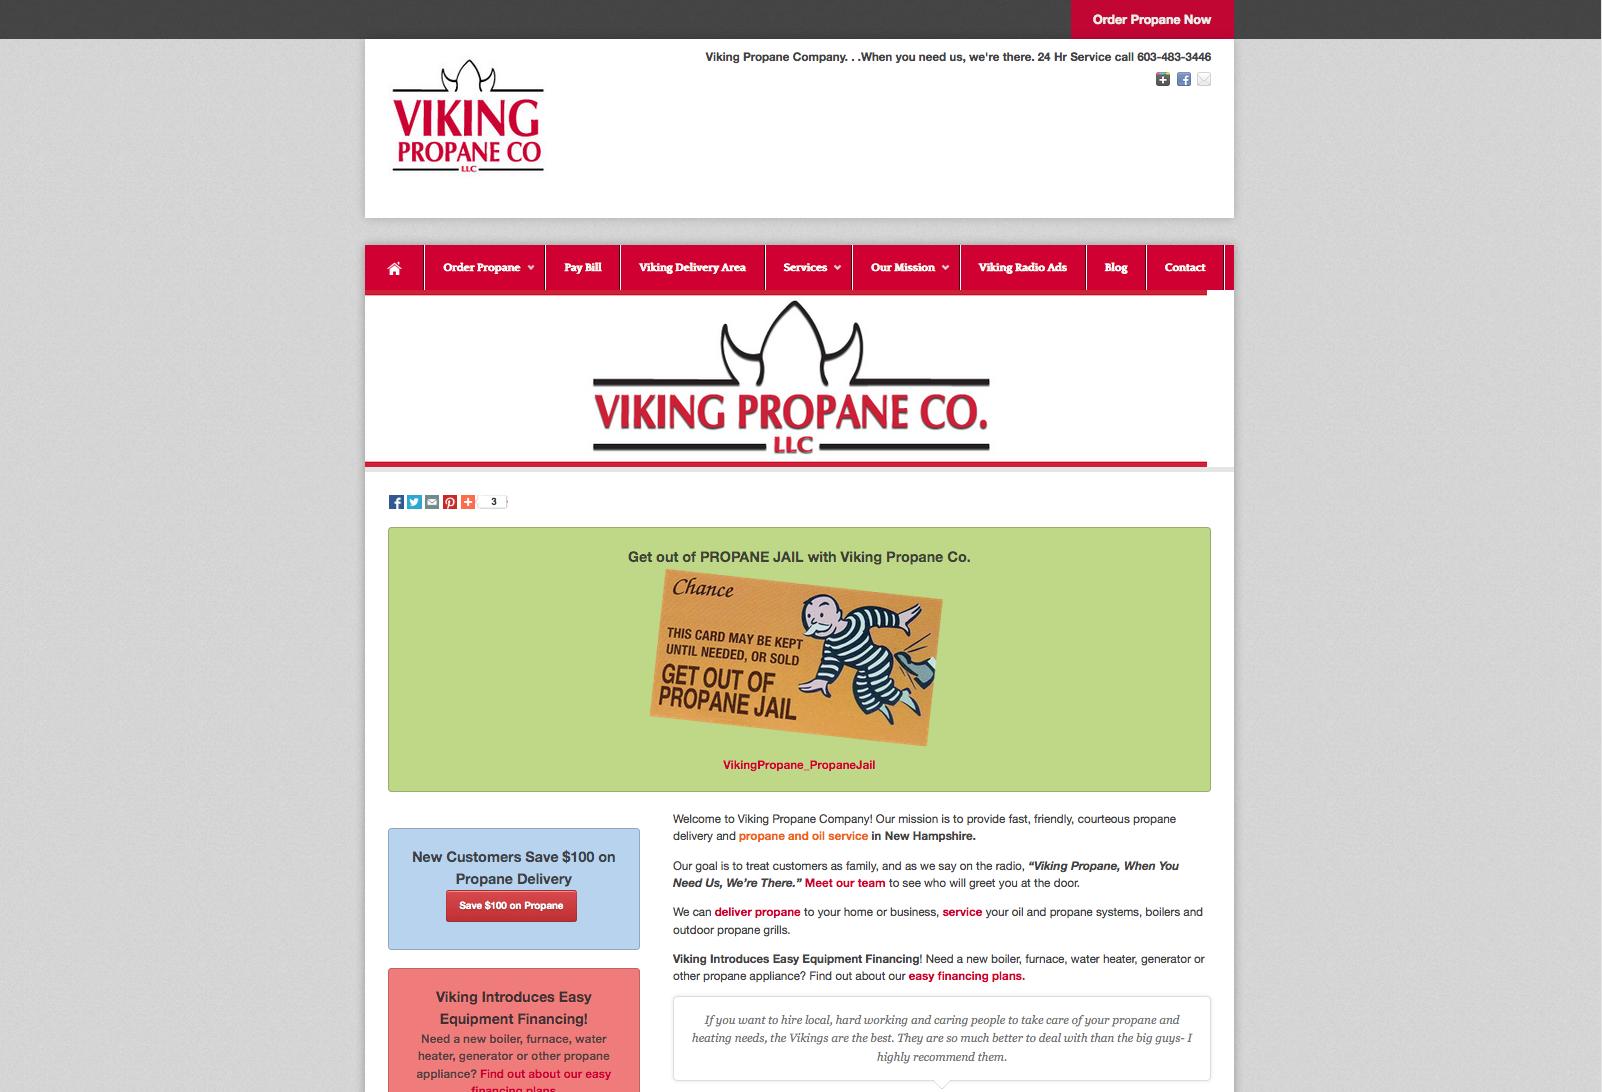 Viking Propane Company